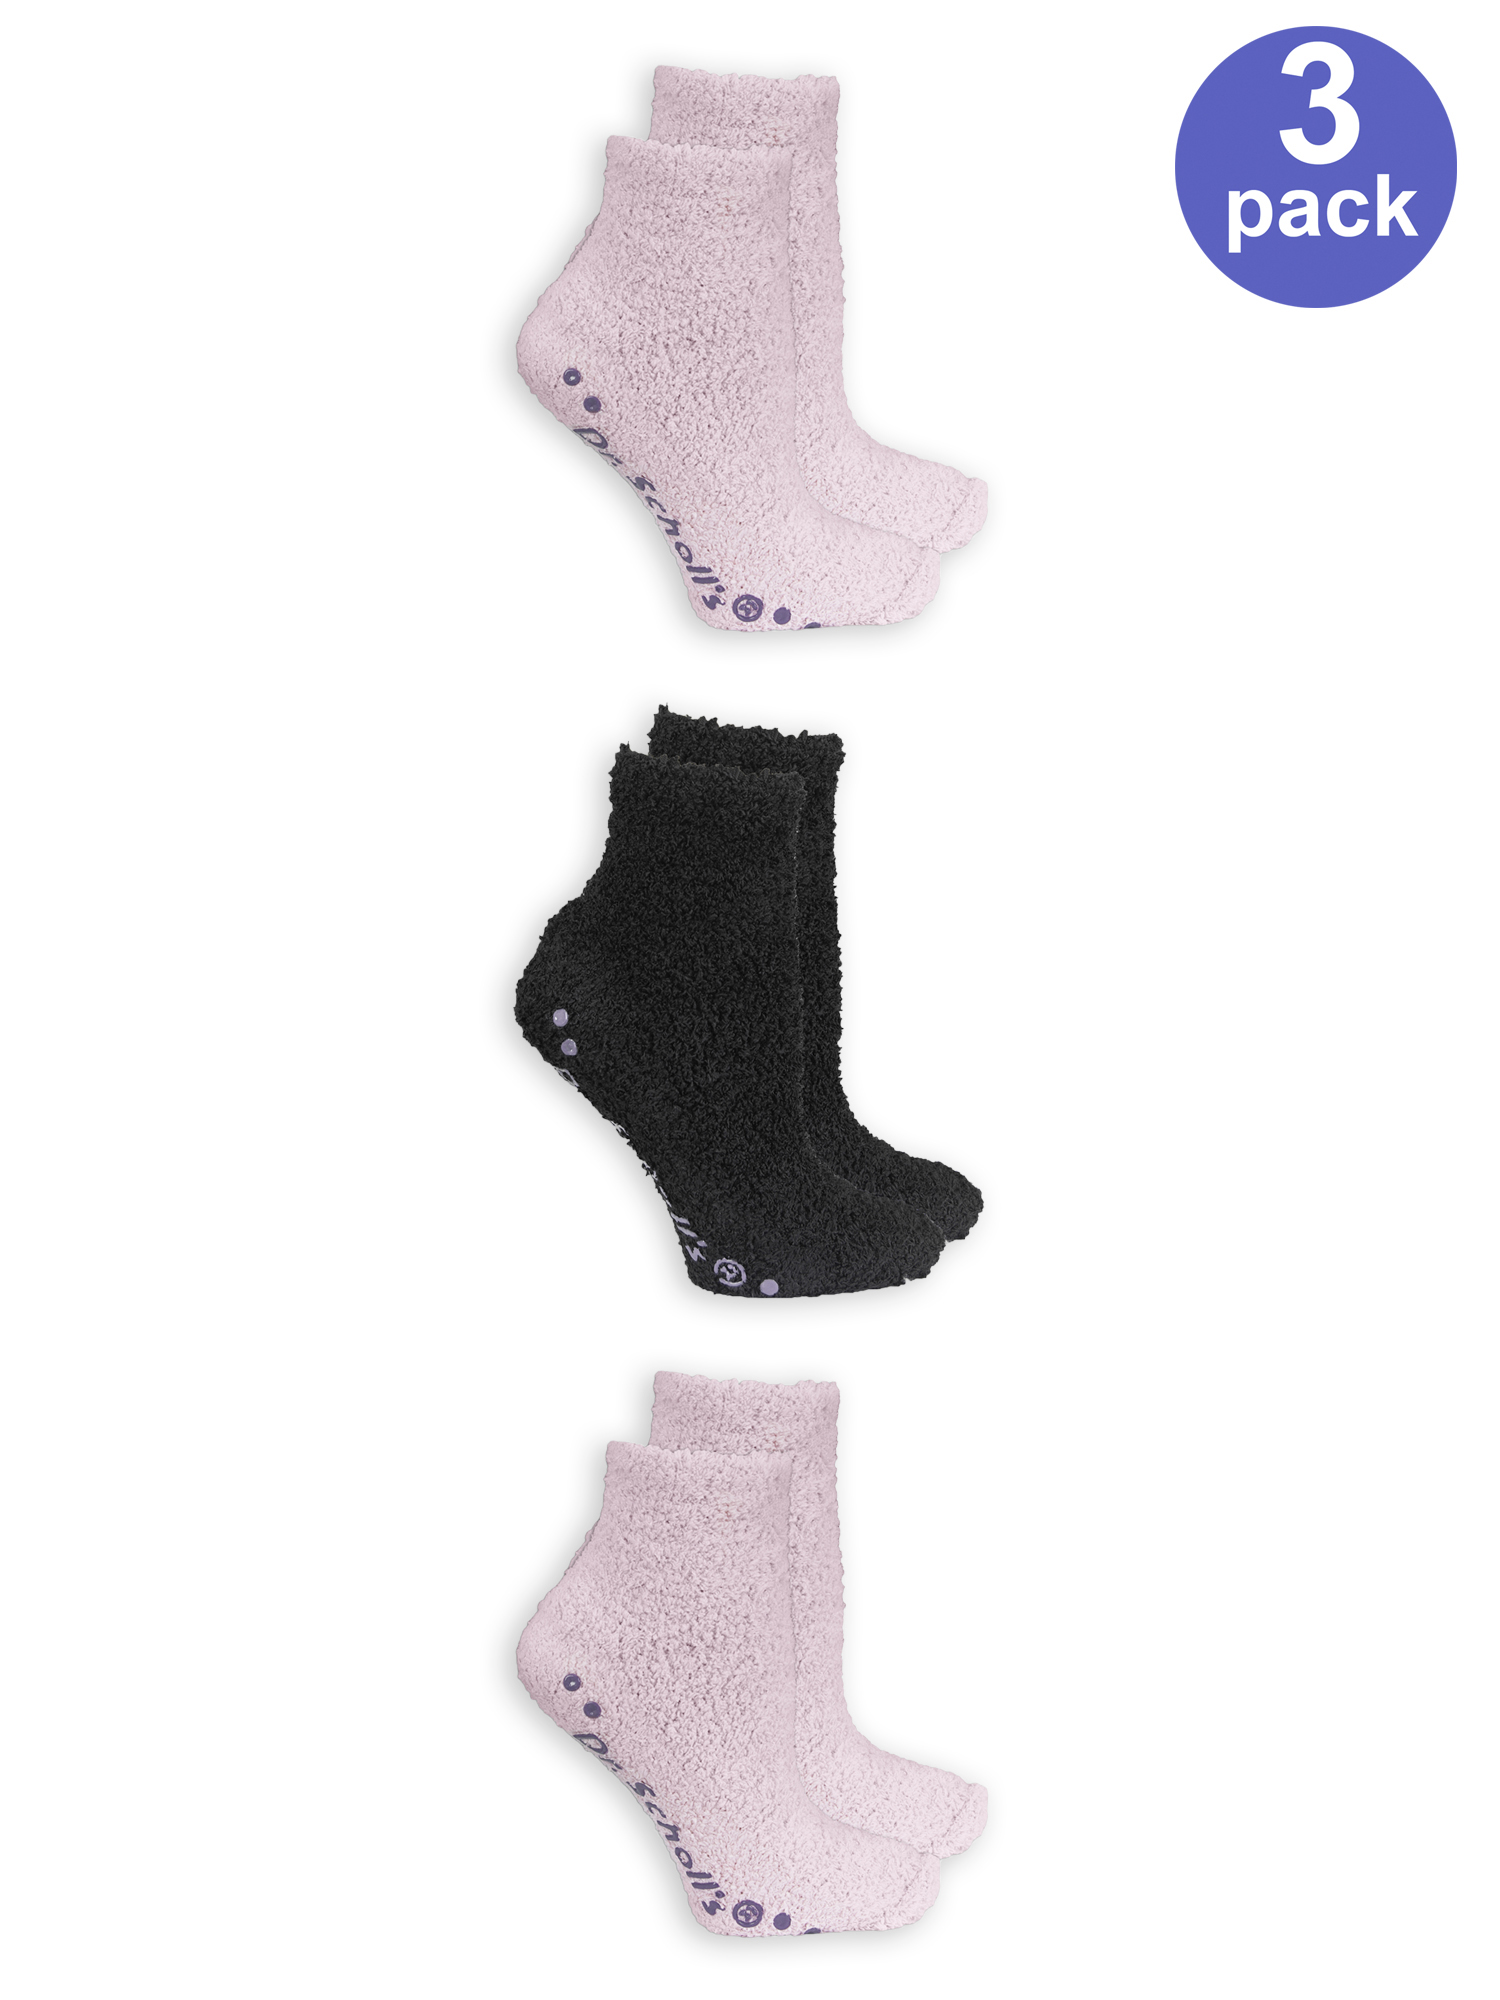 Women's Bonus Pack Low Cut Spa Socks With Grippers 3 Pack